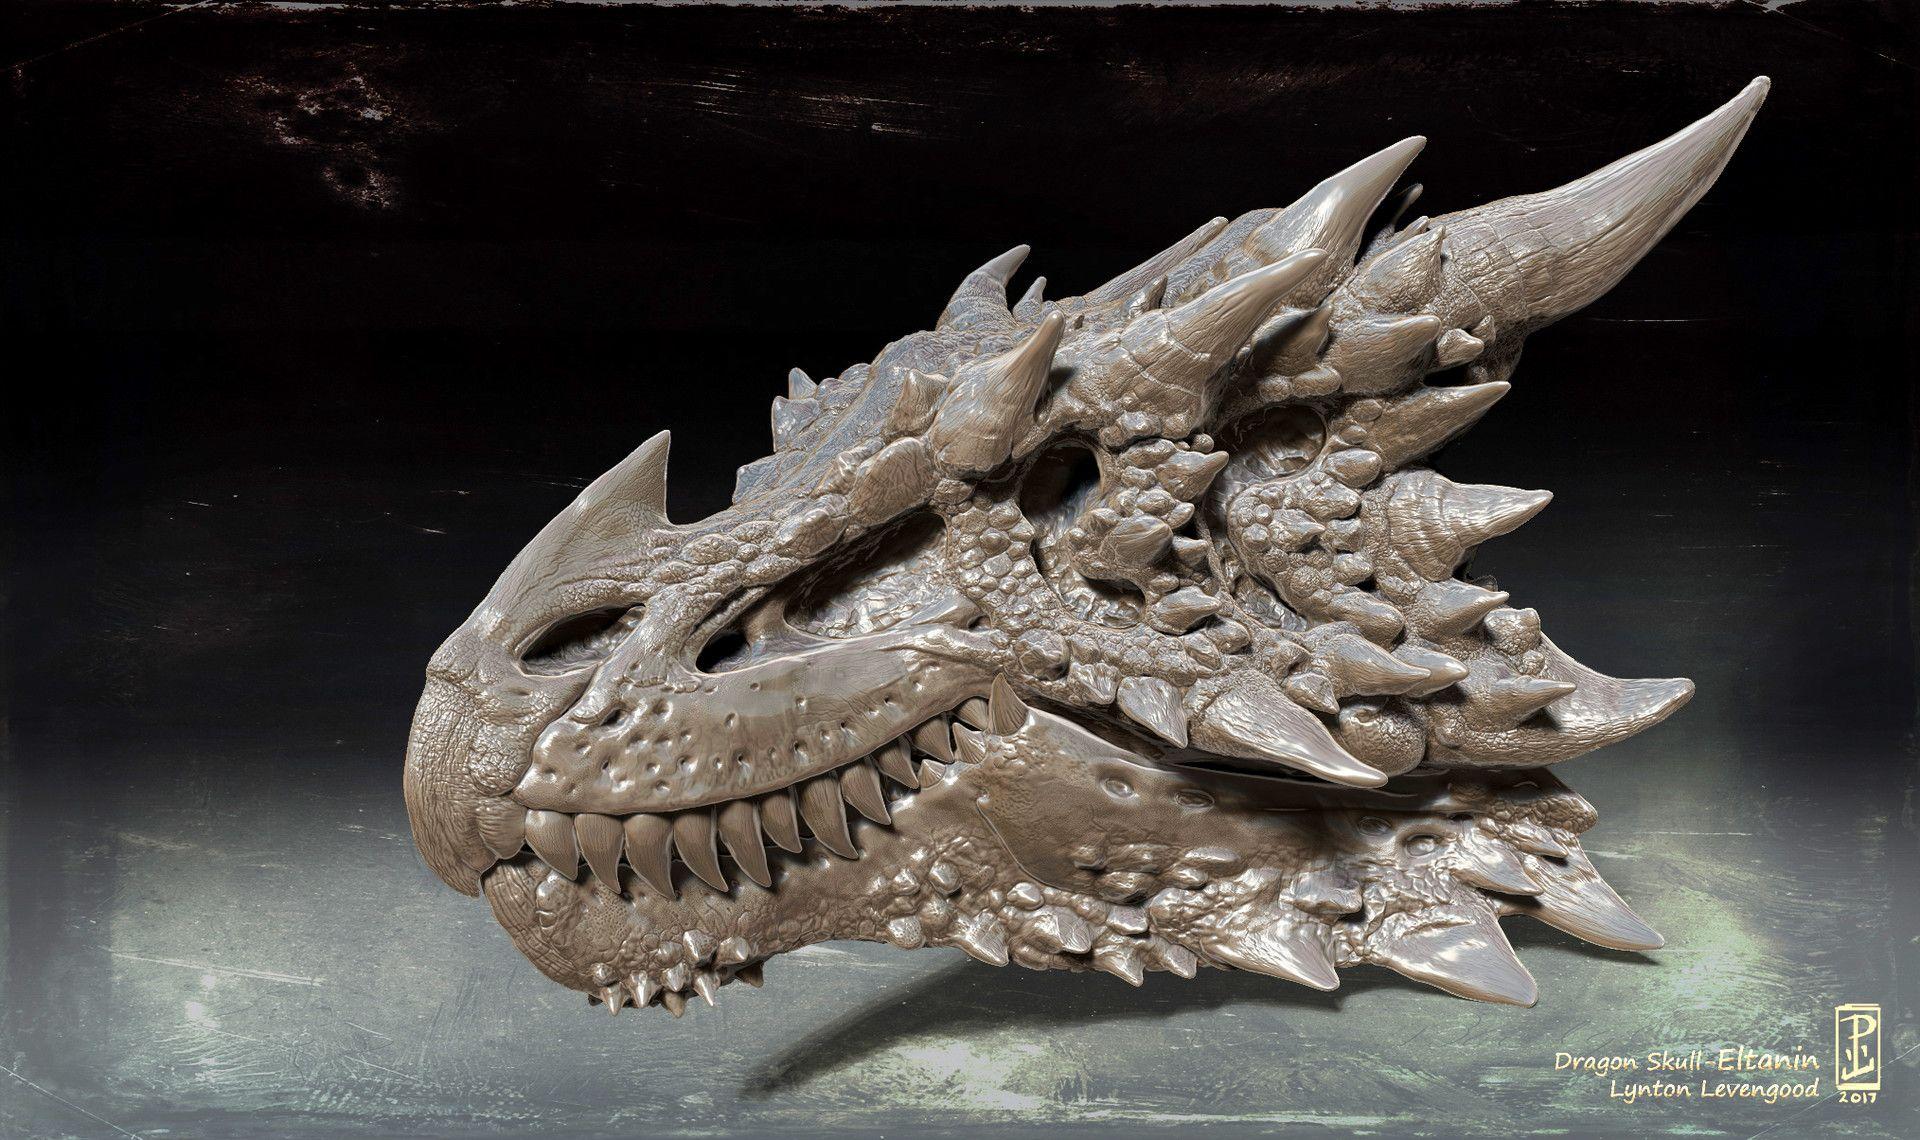 Artstation Dragon Skull Eltanin Lynton Levengood Dragon Bones Dragon Tattoo Drawing Dragon Skeleton Great savings & free delivery / collection on many items. dragon skull eltanin lynton levengood